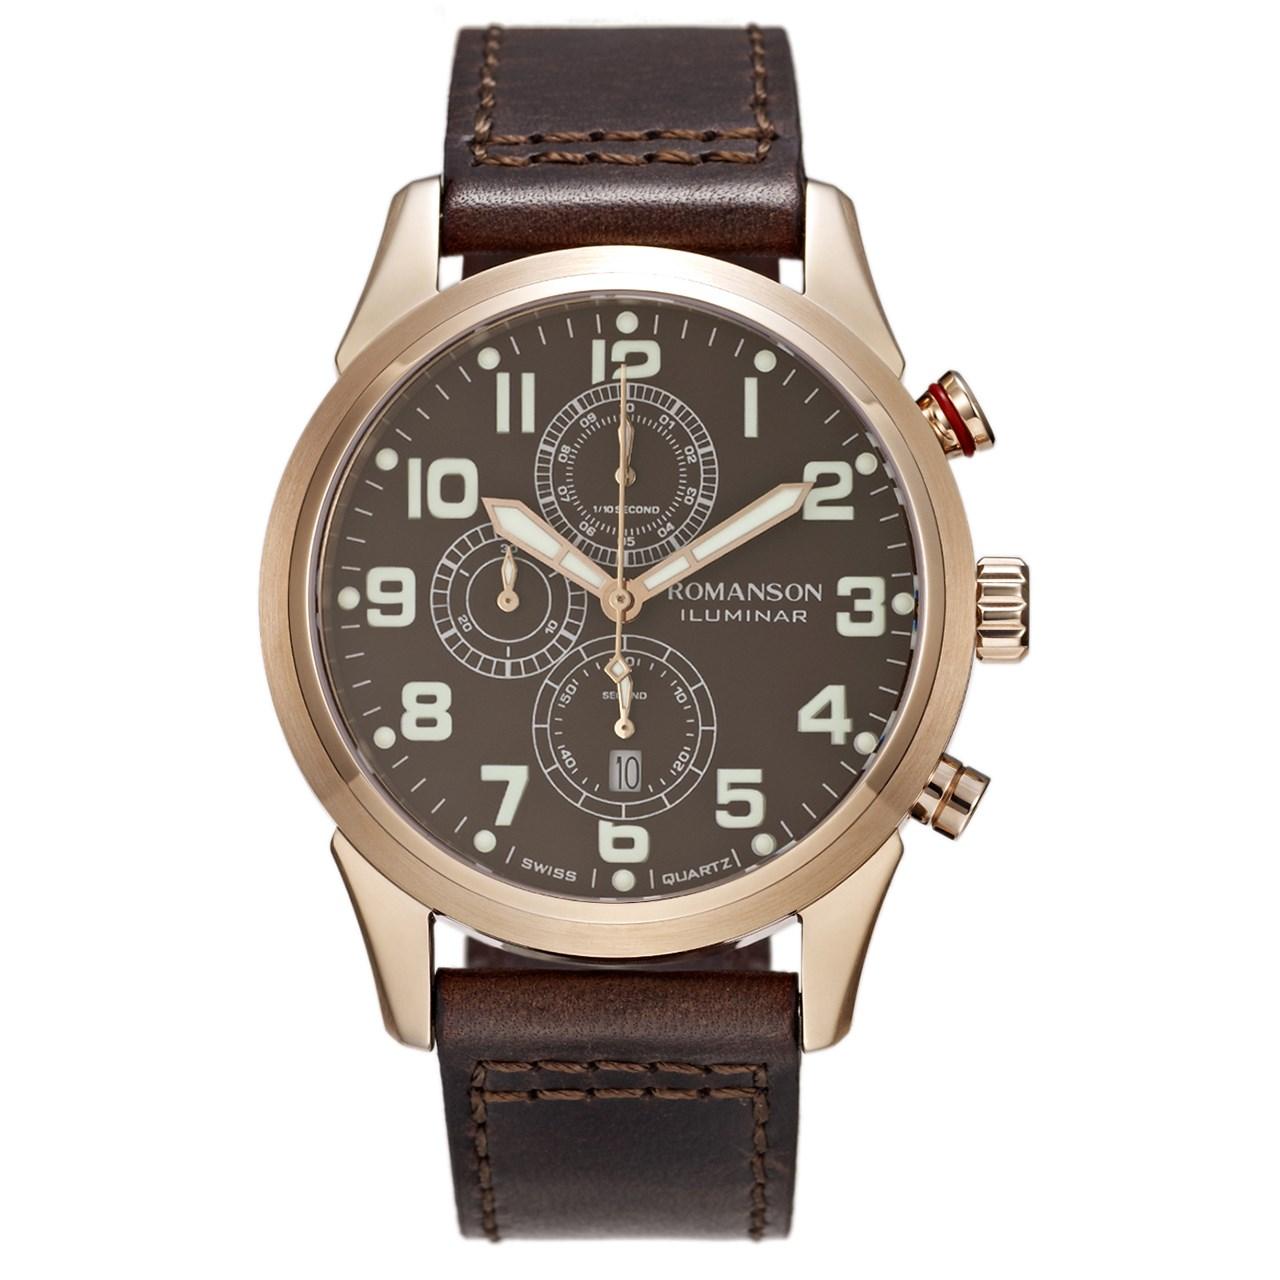 ساعت مچی عقربه ای مردانه رومانسون مدل AL6A14HMNRABR5 50